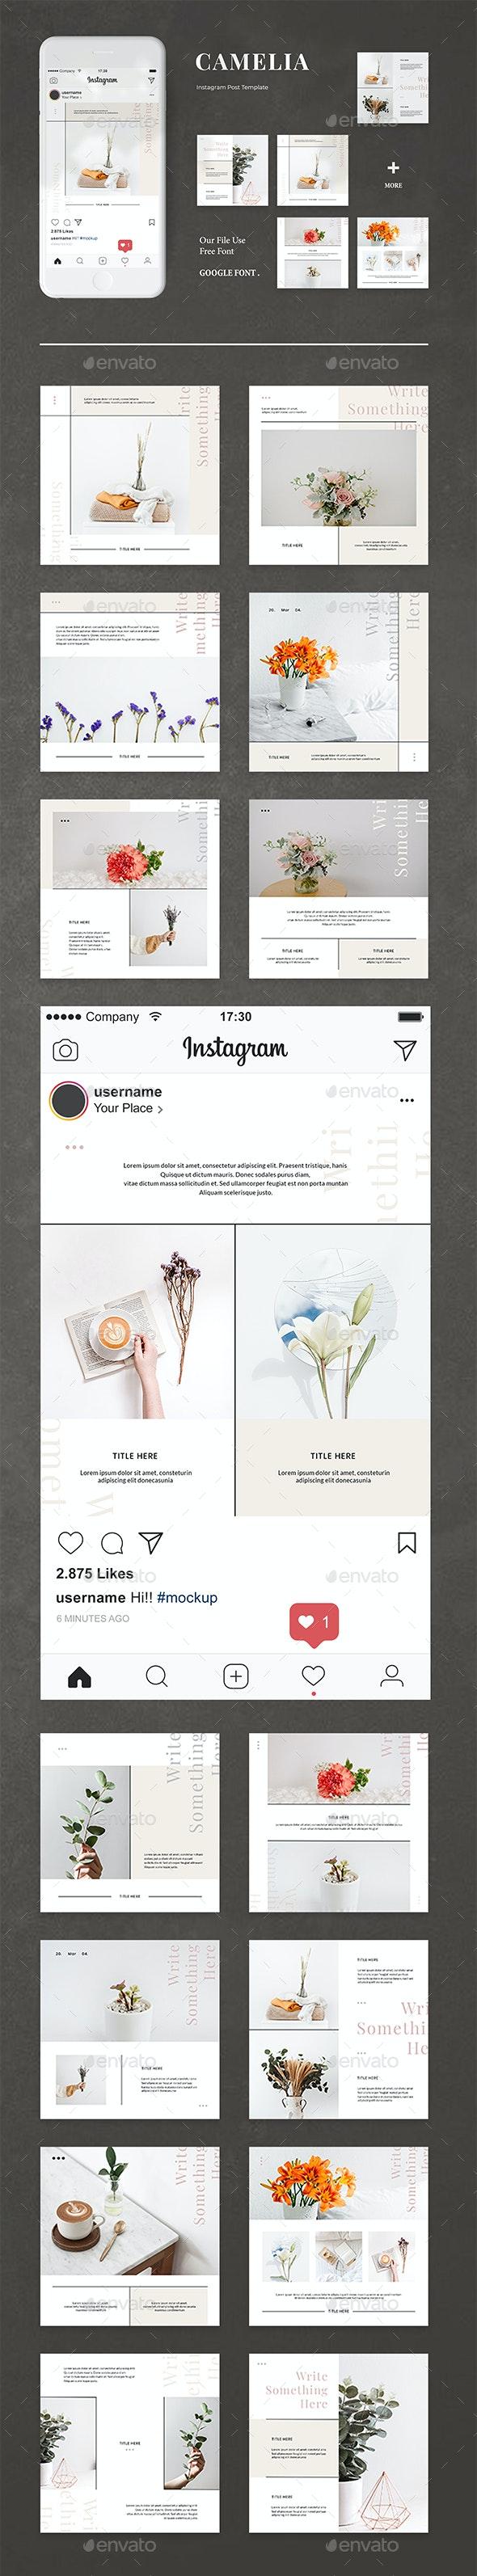 Camelia - Instagram Post Template - Social Media Web Elements